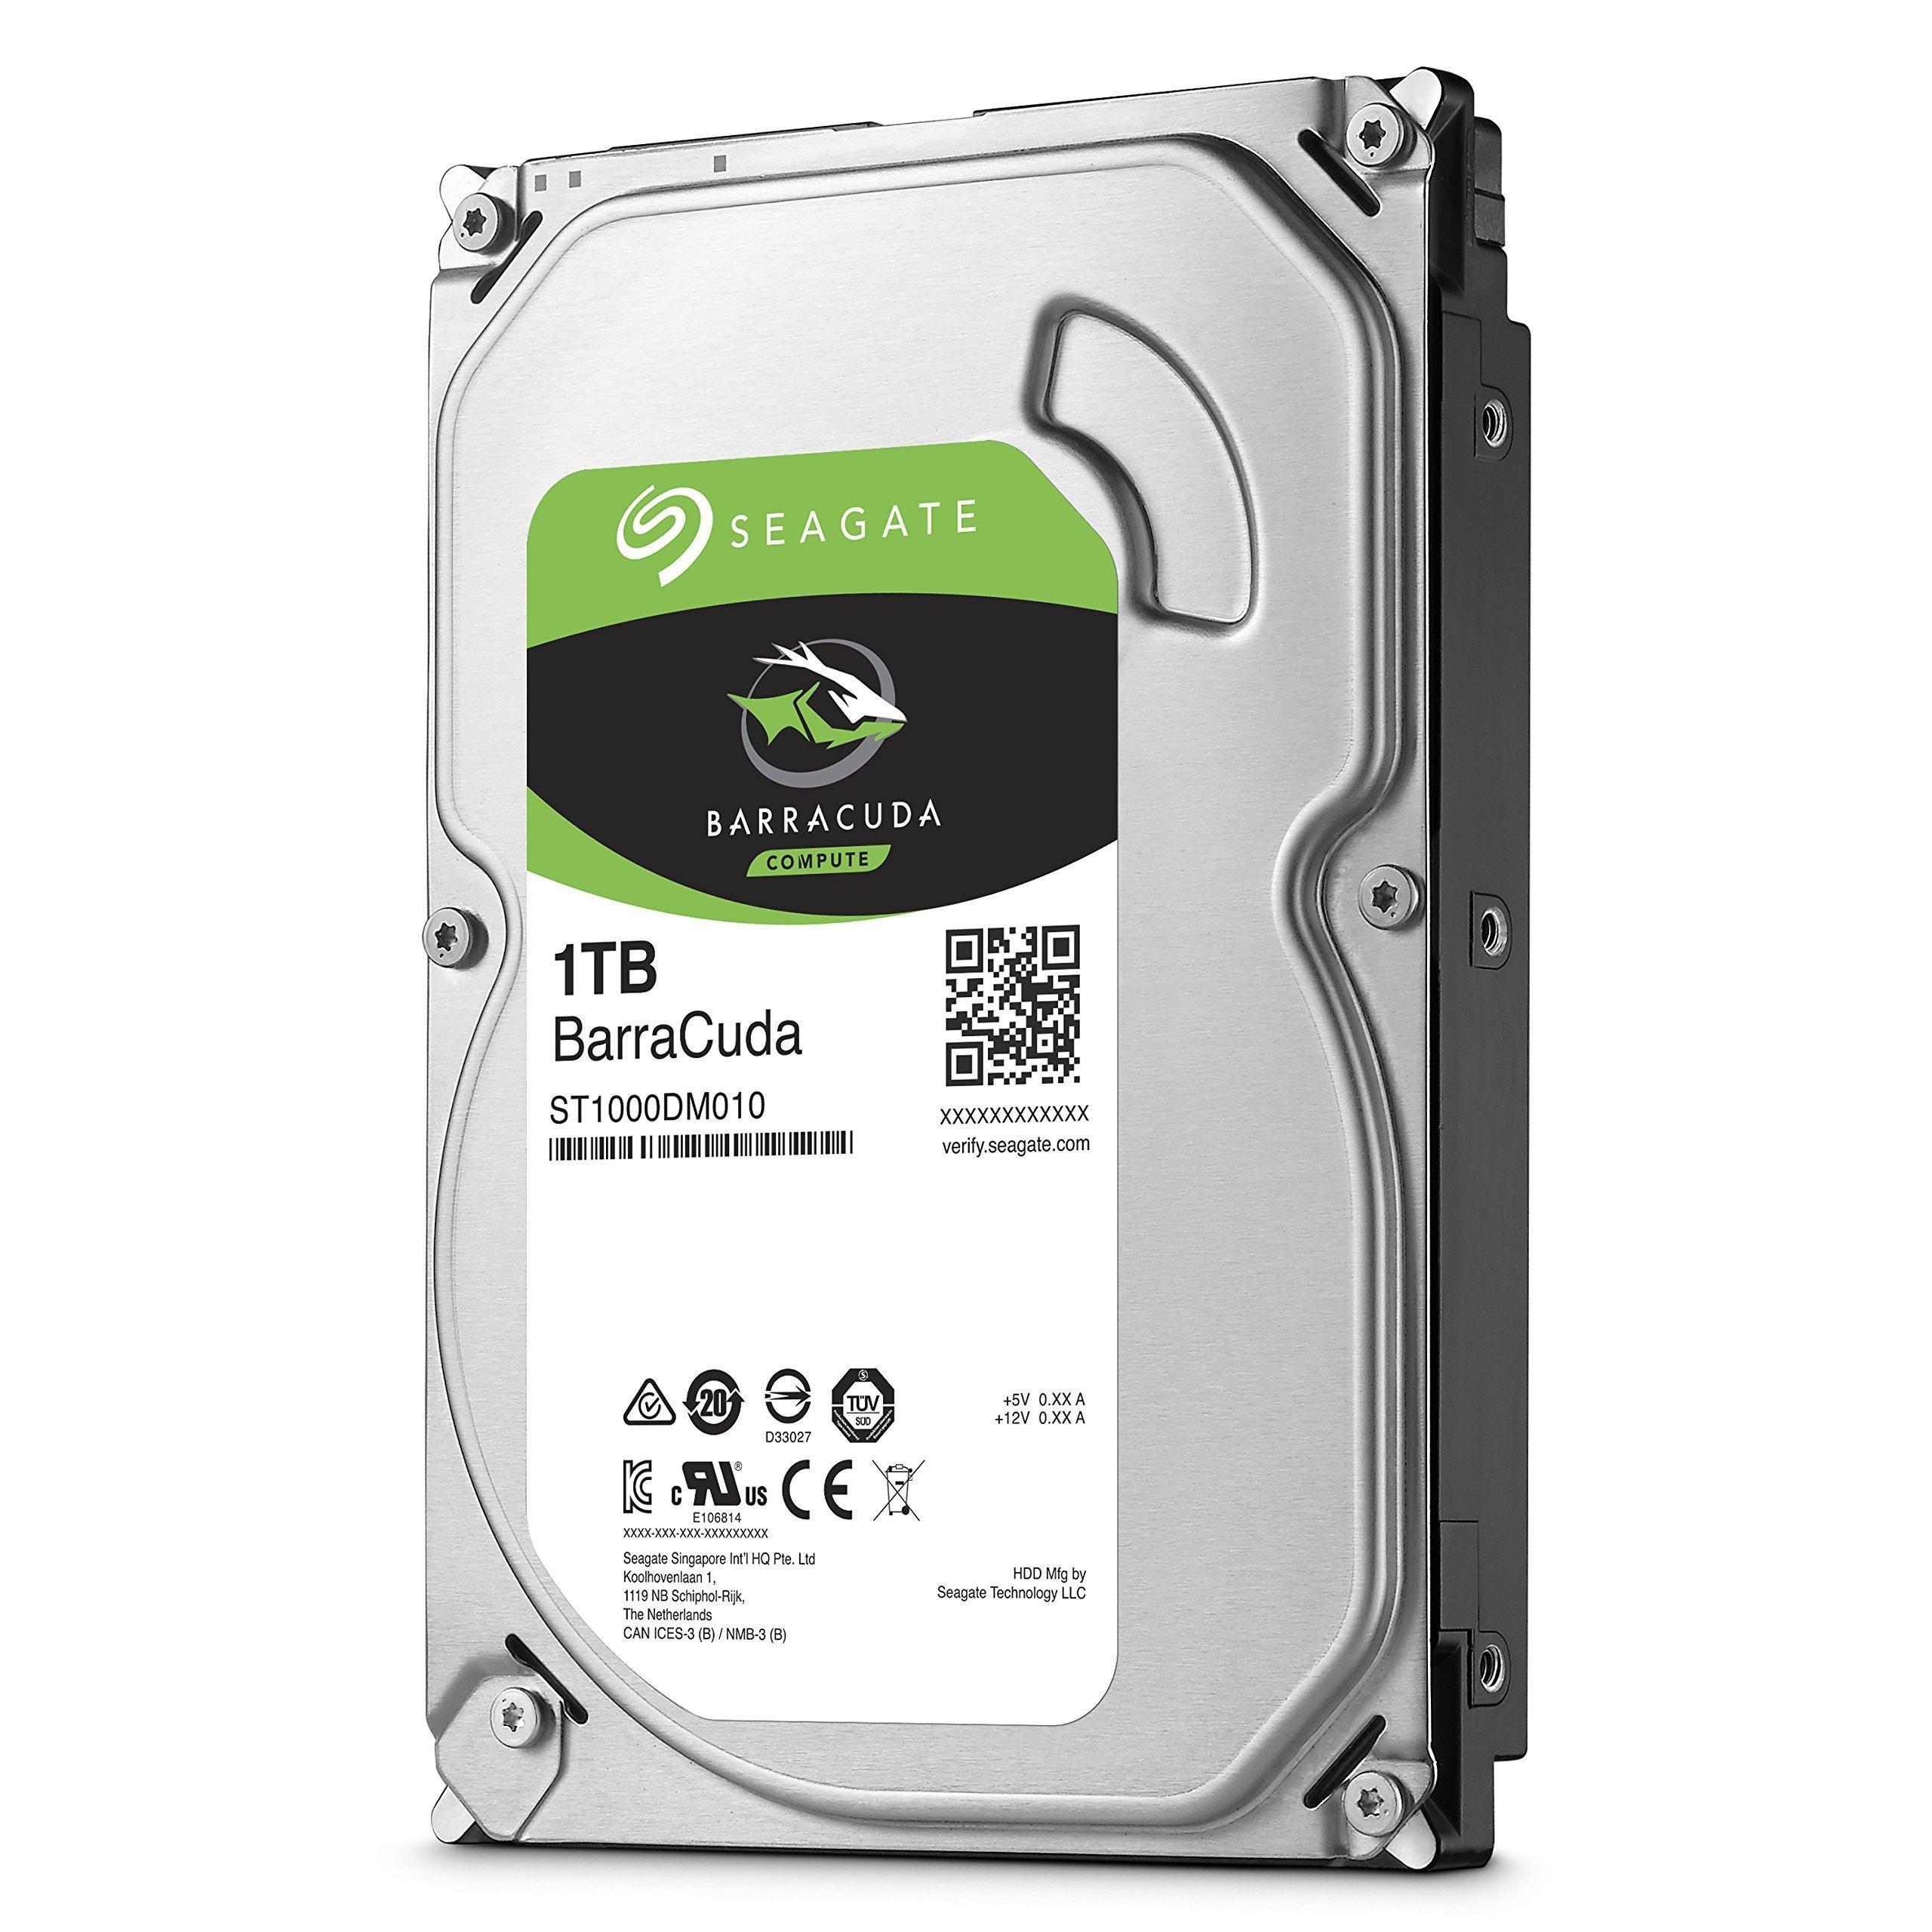 SEAGATE 500GB 3.5 SATA III 32MB ST500DM009 Barracuda Guardian